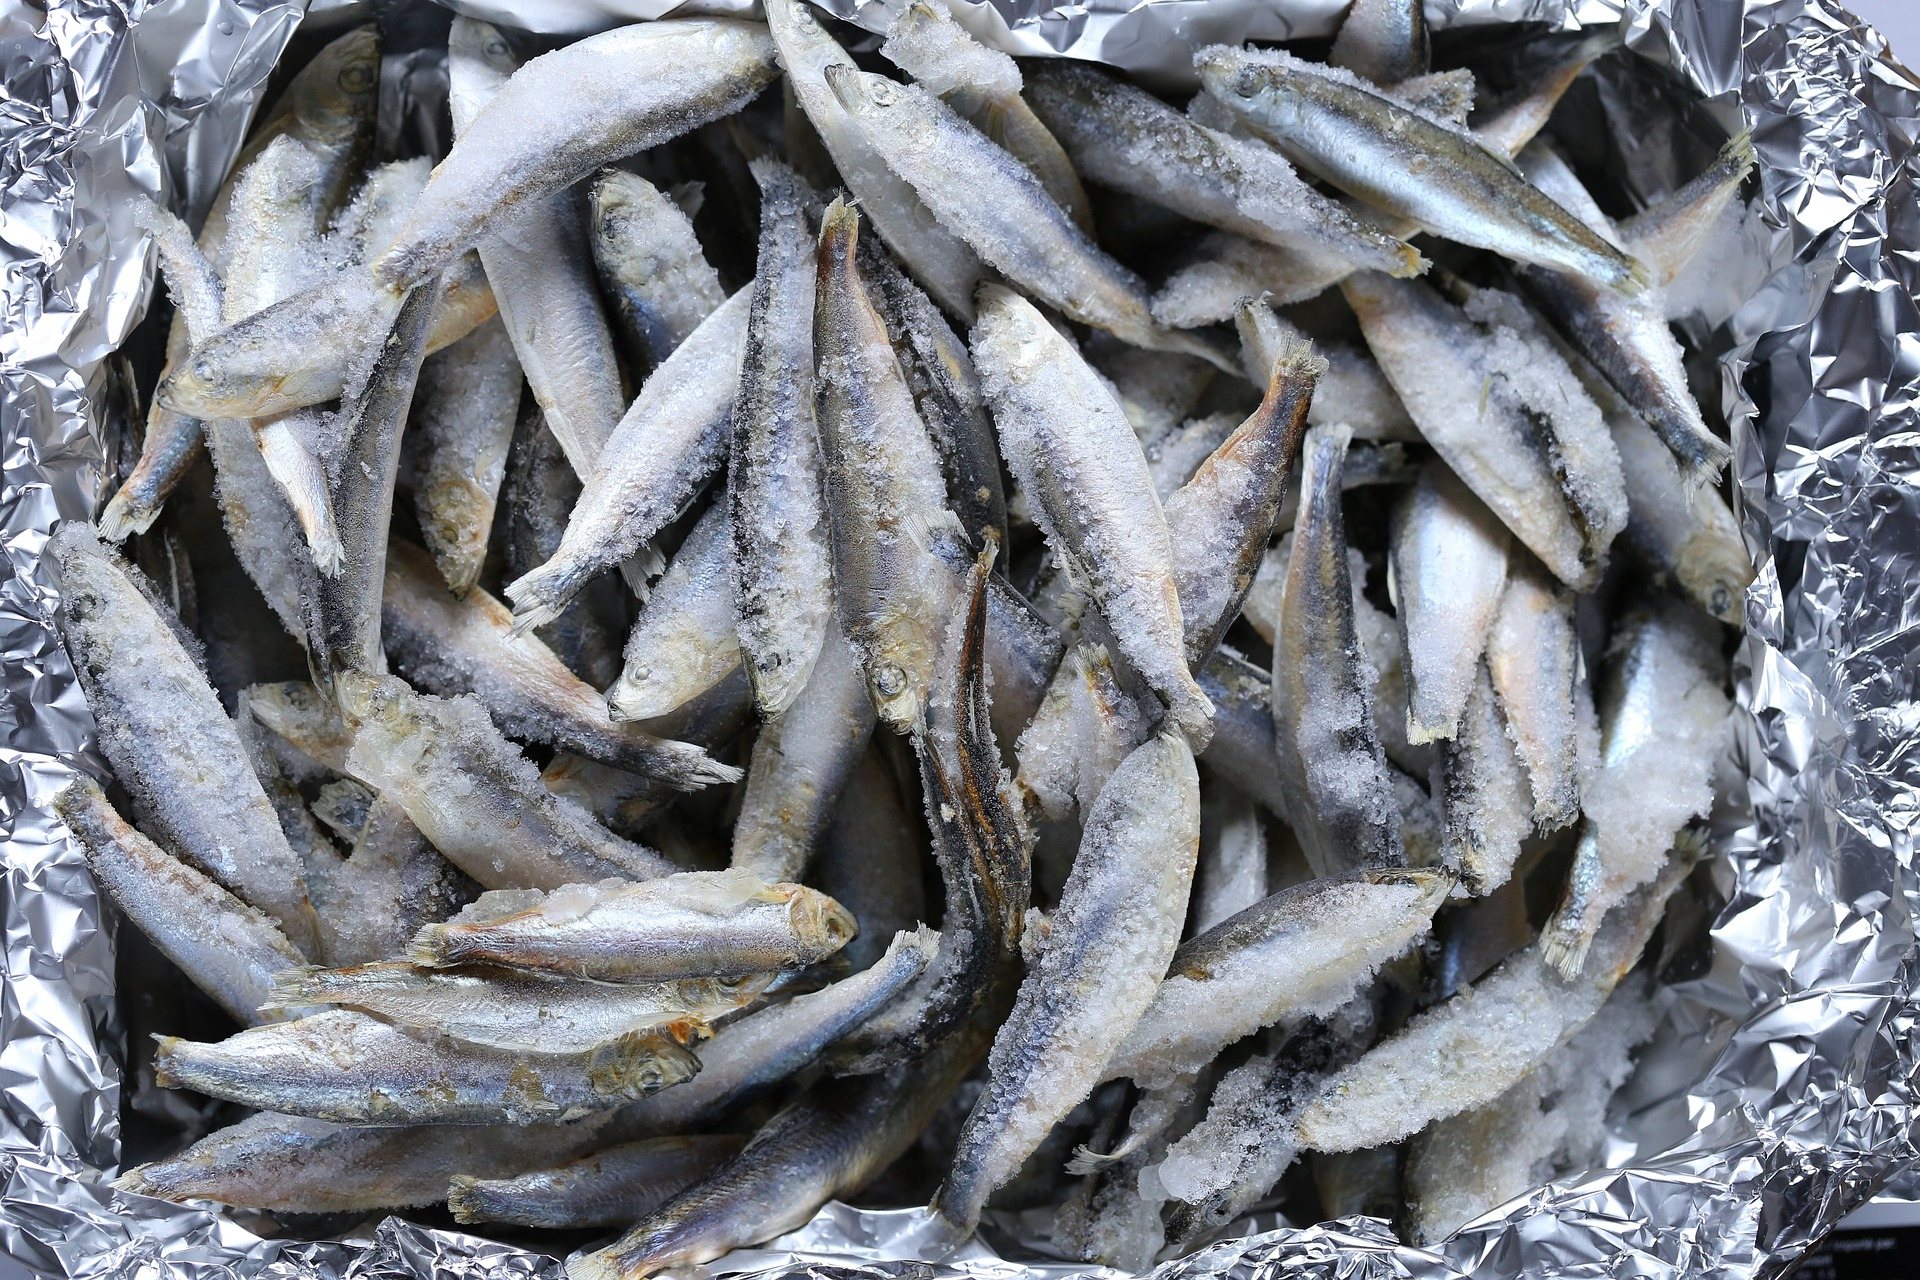 Ryby mrożone: tusze, filety, dzwonka